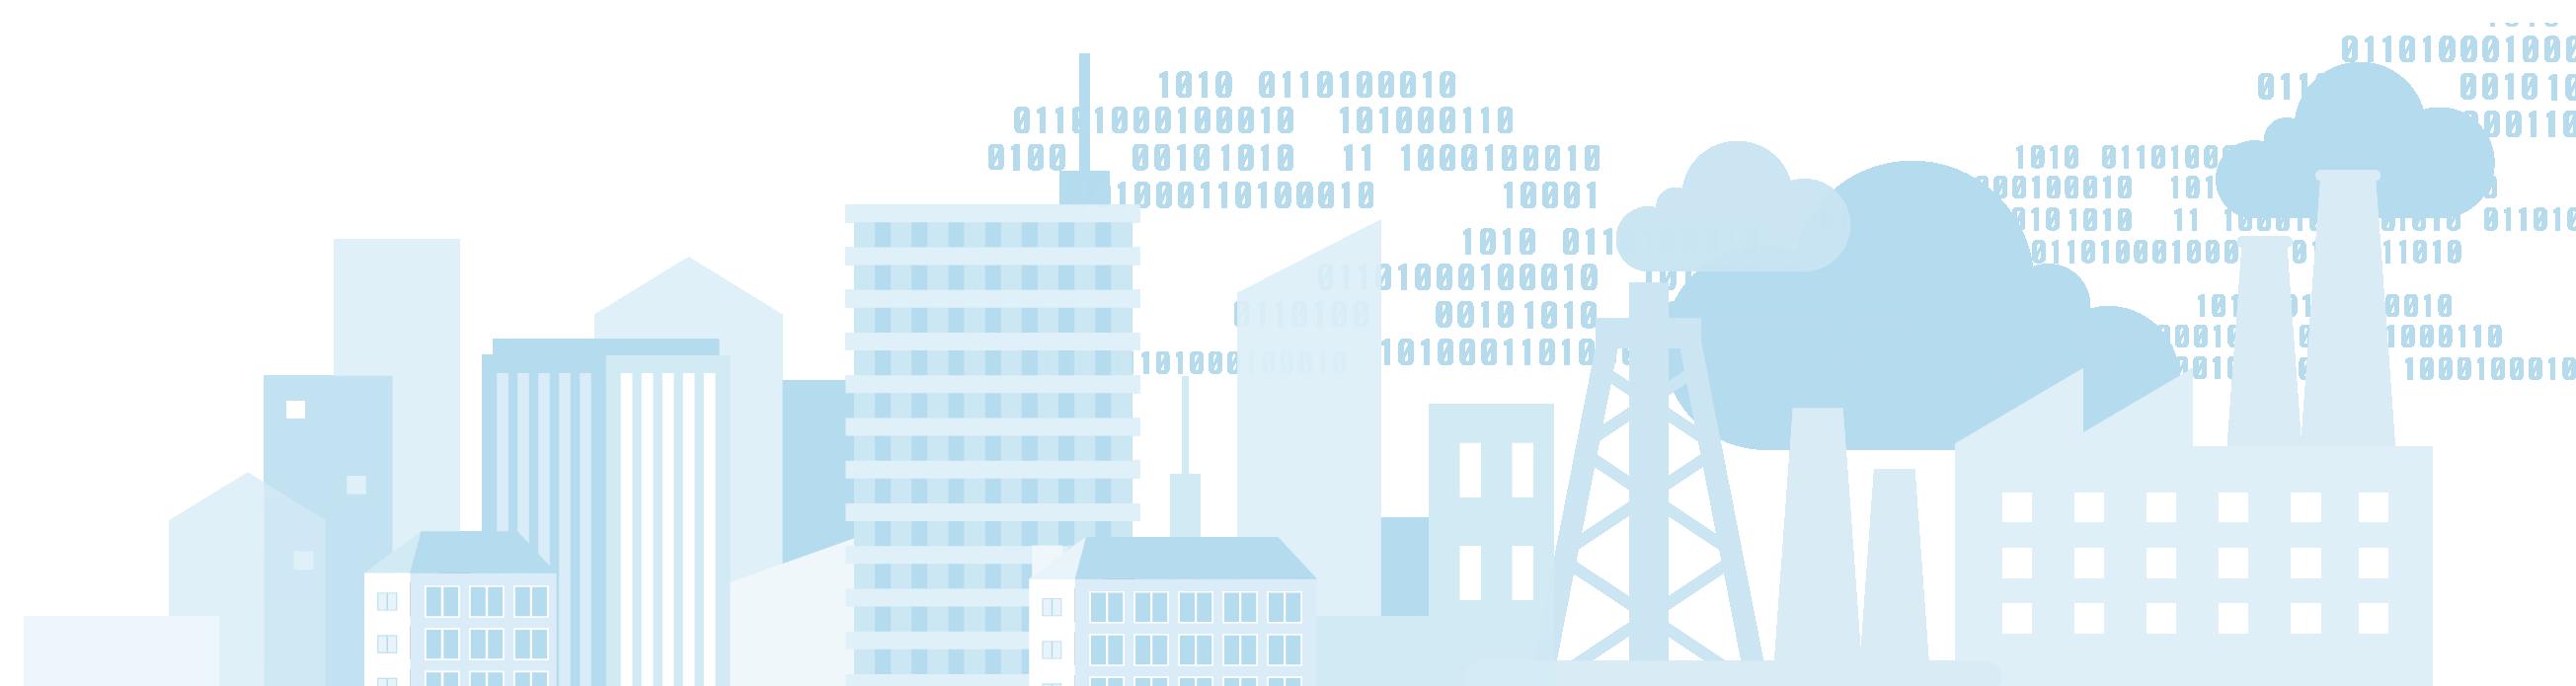 DigitalReadiness-Concept-BigCitiesandPlants